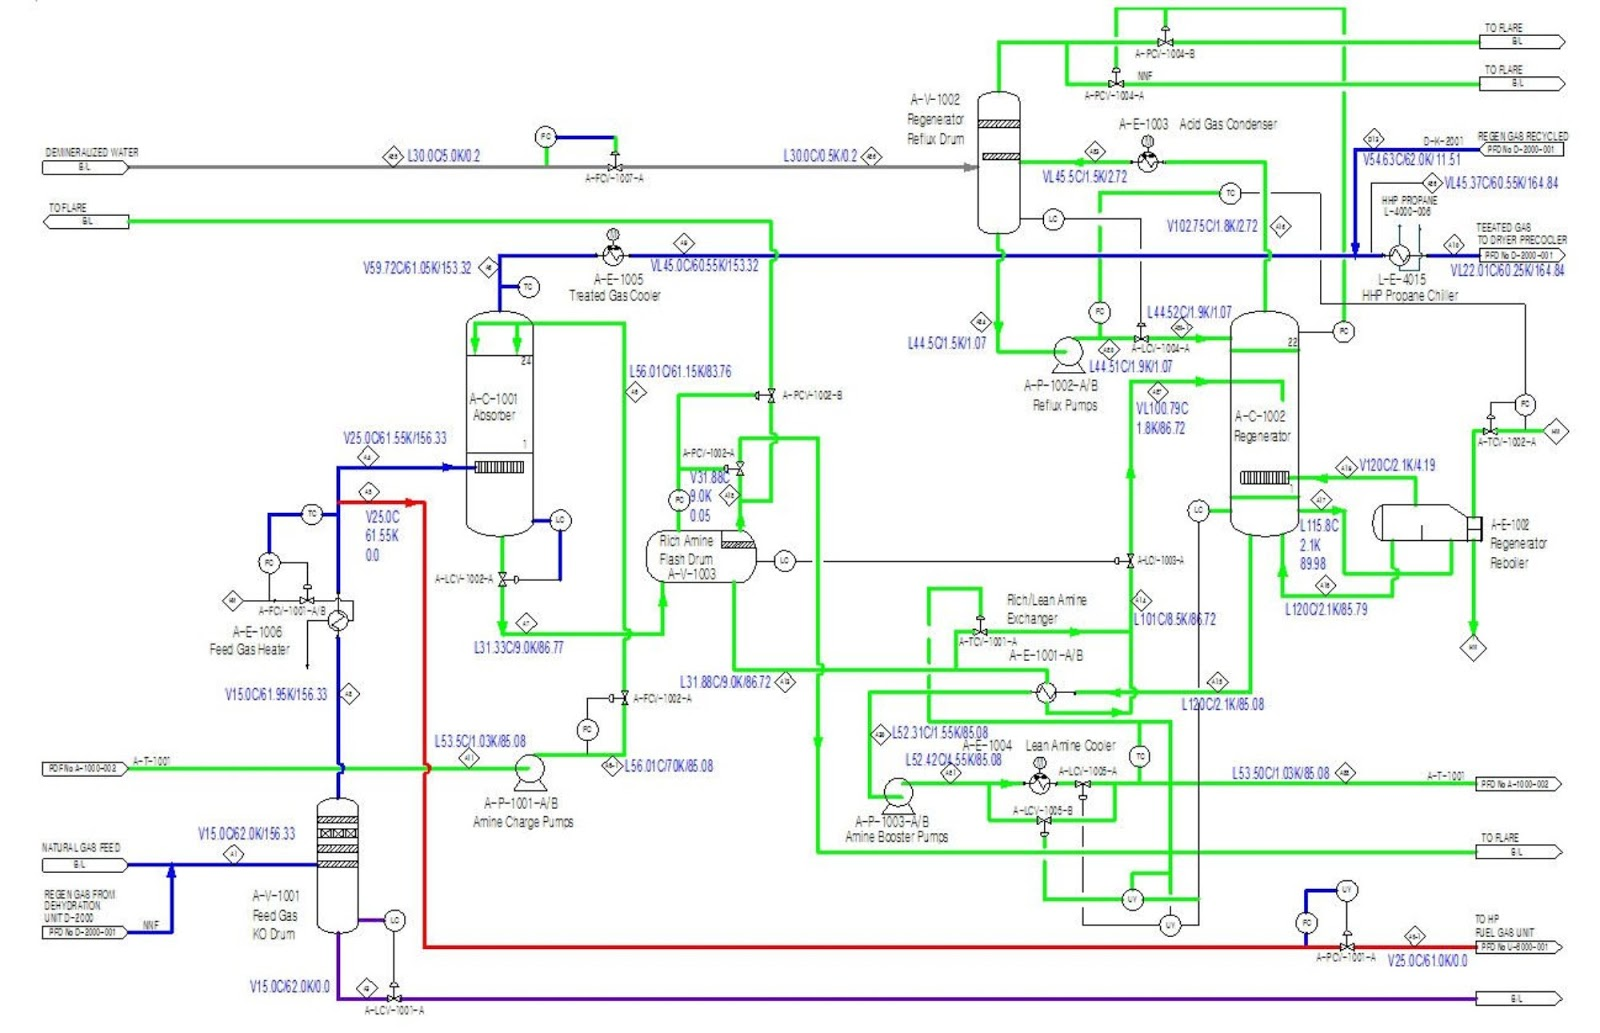 medium resolution of proces flow diagram lng plant